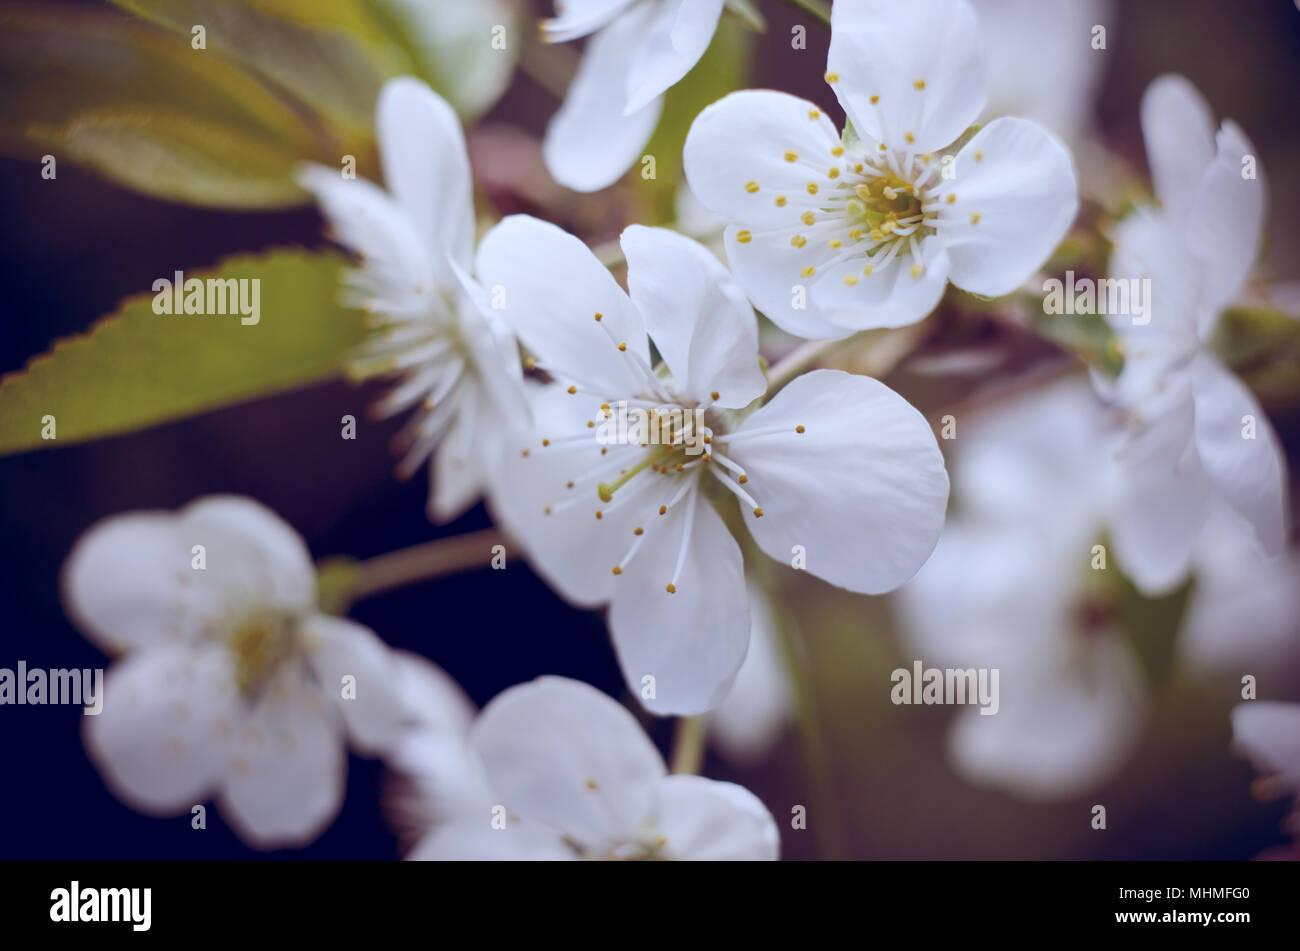 Cherry Tree Blossoms White Spring Flowers Close Up Soft Focus